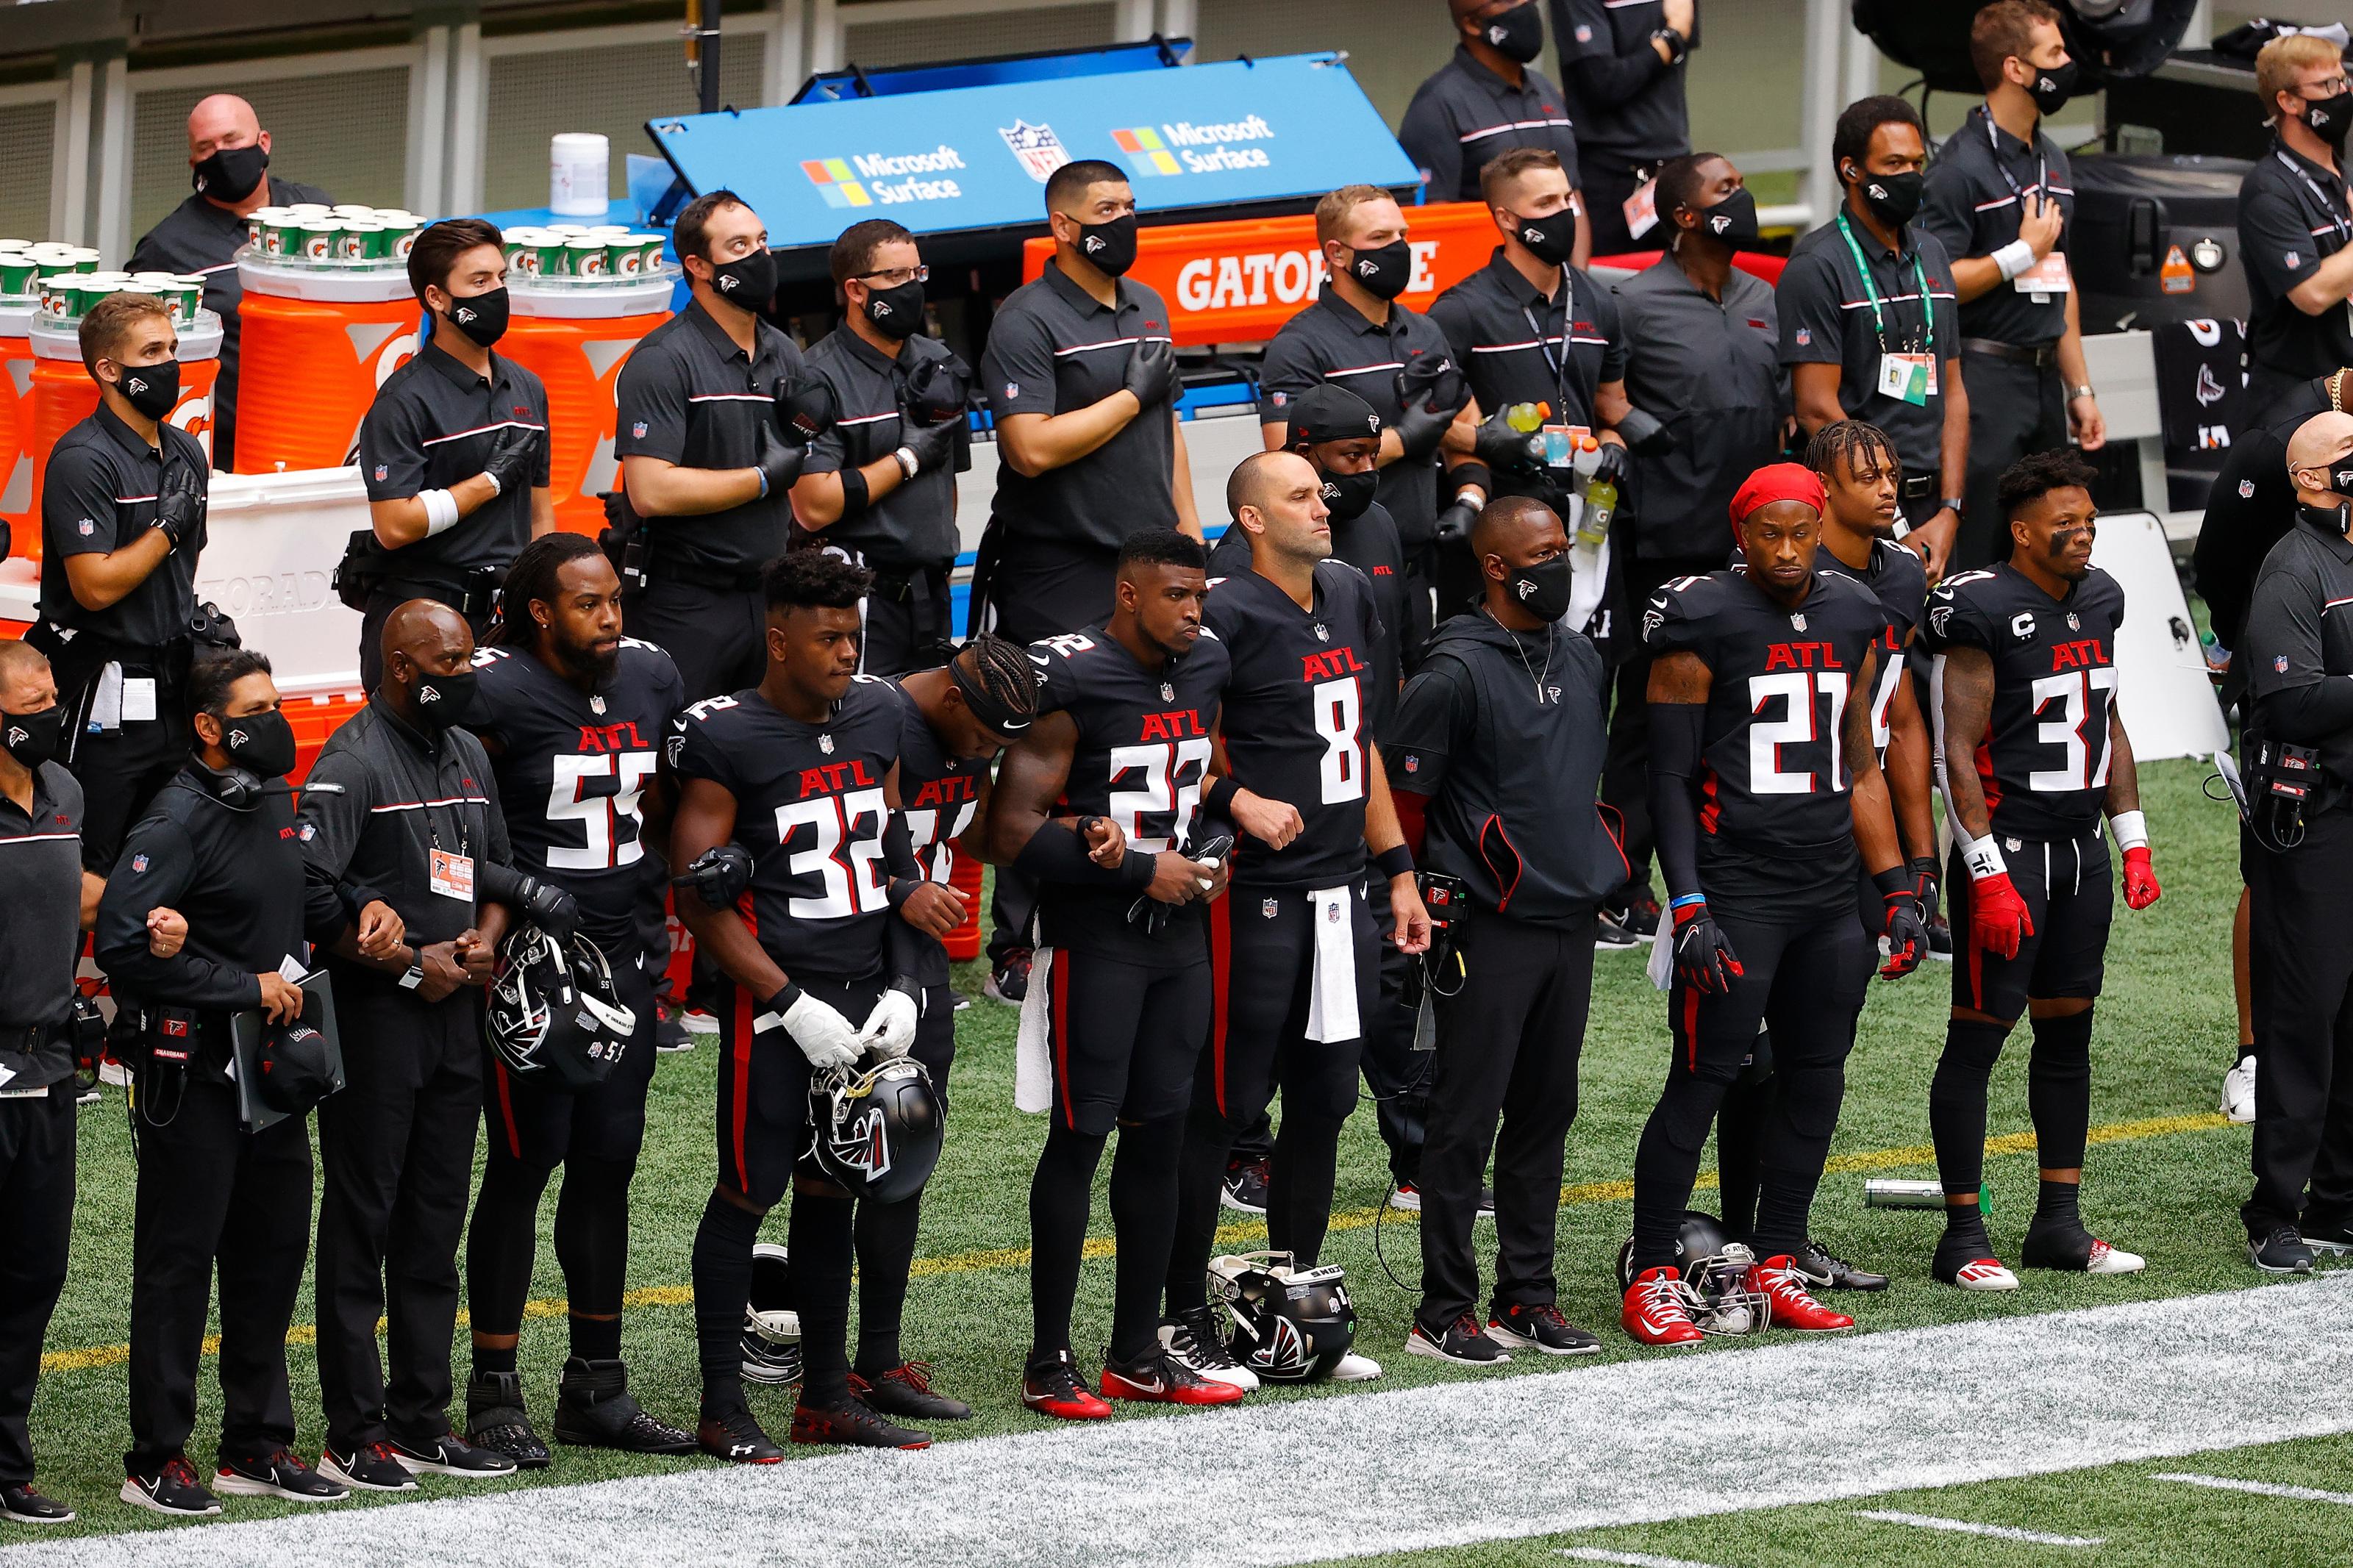 Atlanta Falcons Week 1 Loss To Seahawks Looked All Too Familiar